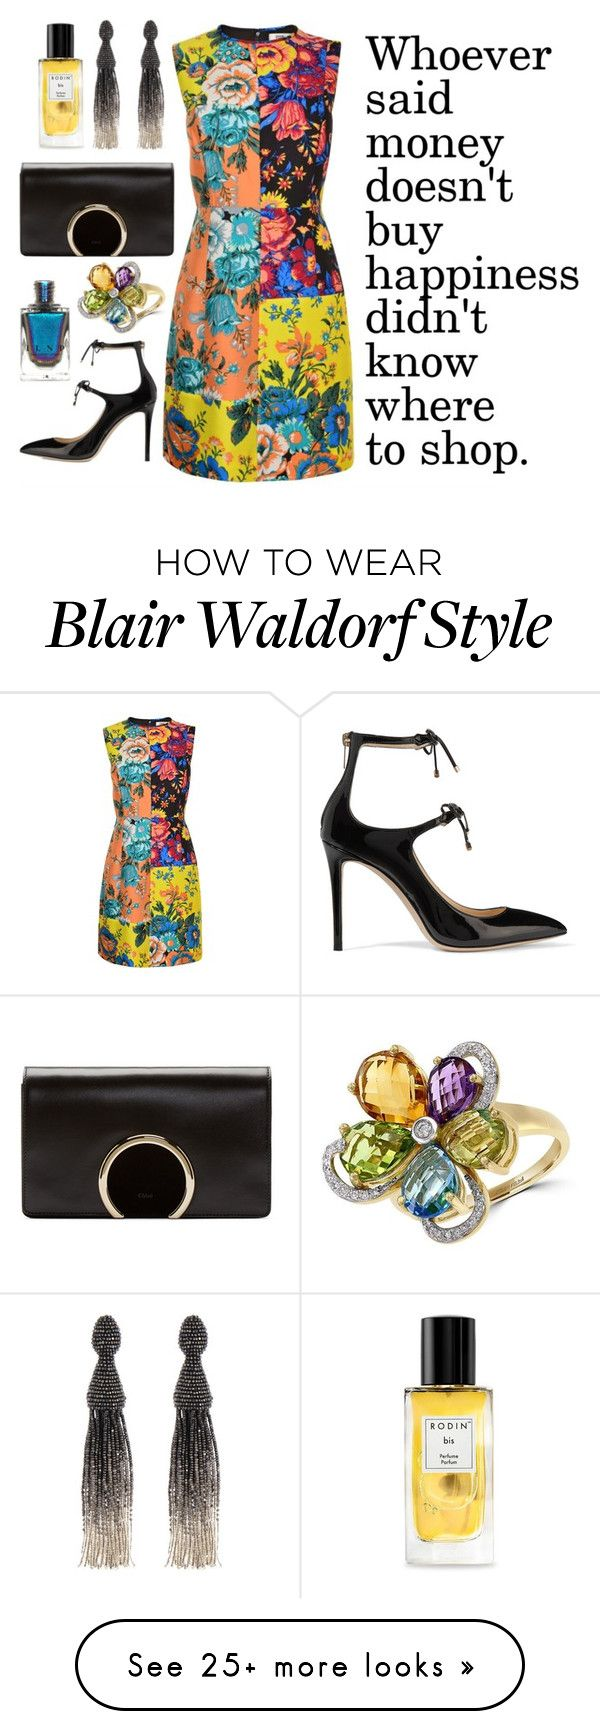 """Blair Waldorf's wisdom"" by theodor44444 on Polyvore featuring Diane Von Furstenberg, Jimmy Choo, Chloé, Oscar de la Renta, Rodin and Effy Jewelry"